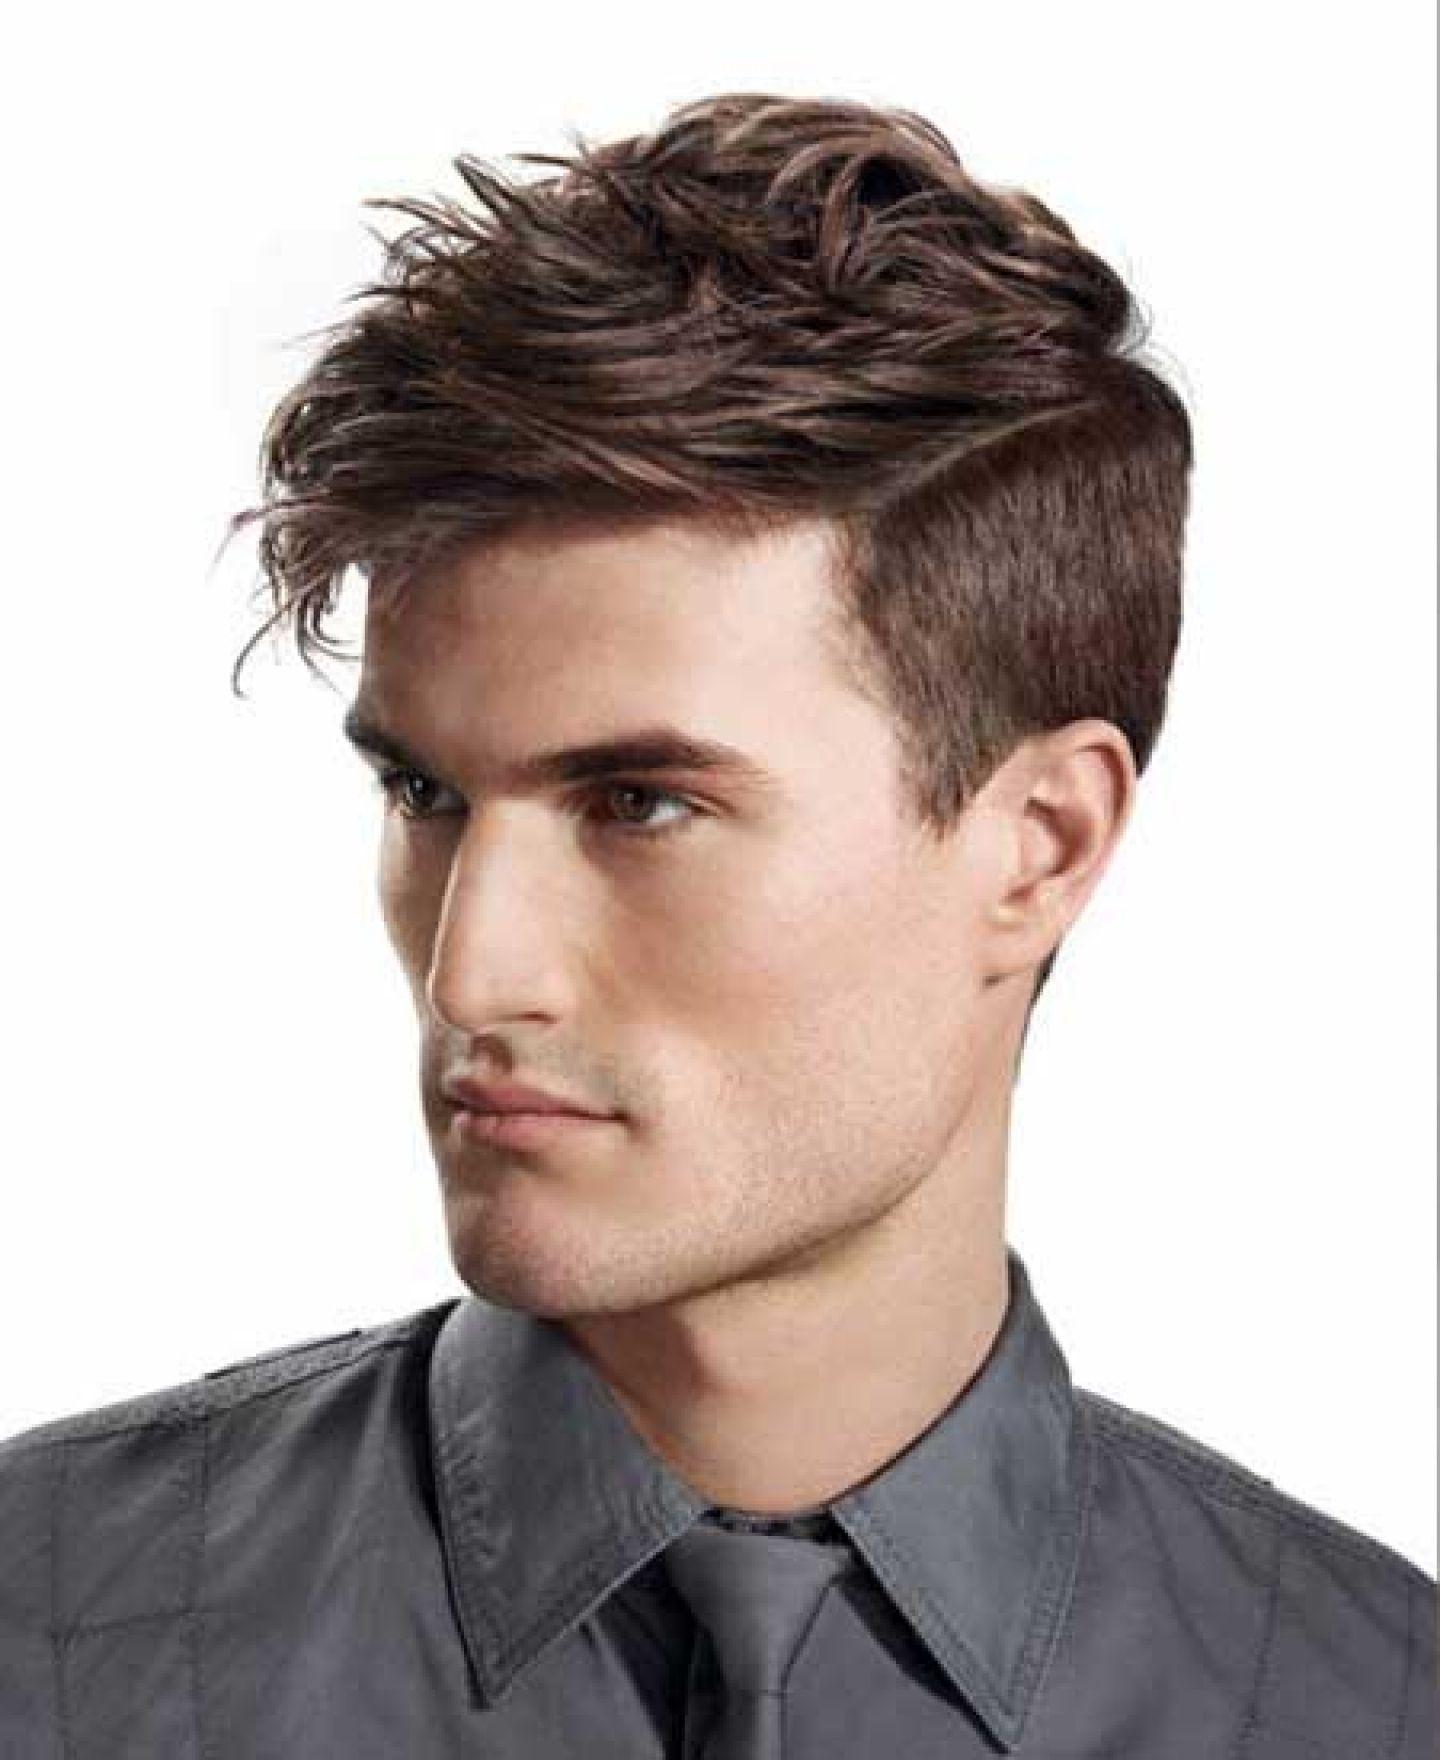 teenage boys hairstyles 2015 - Google Search   Boys hair ...